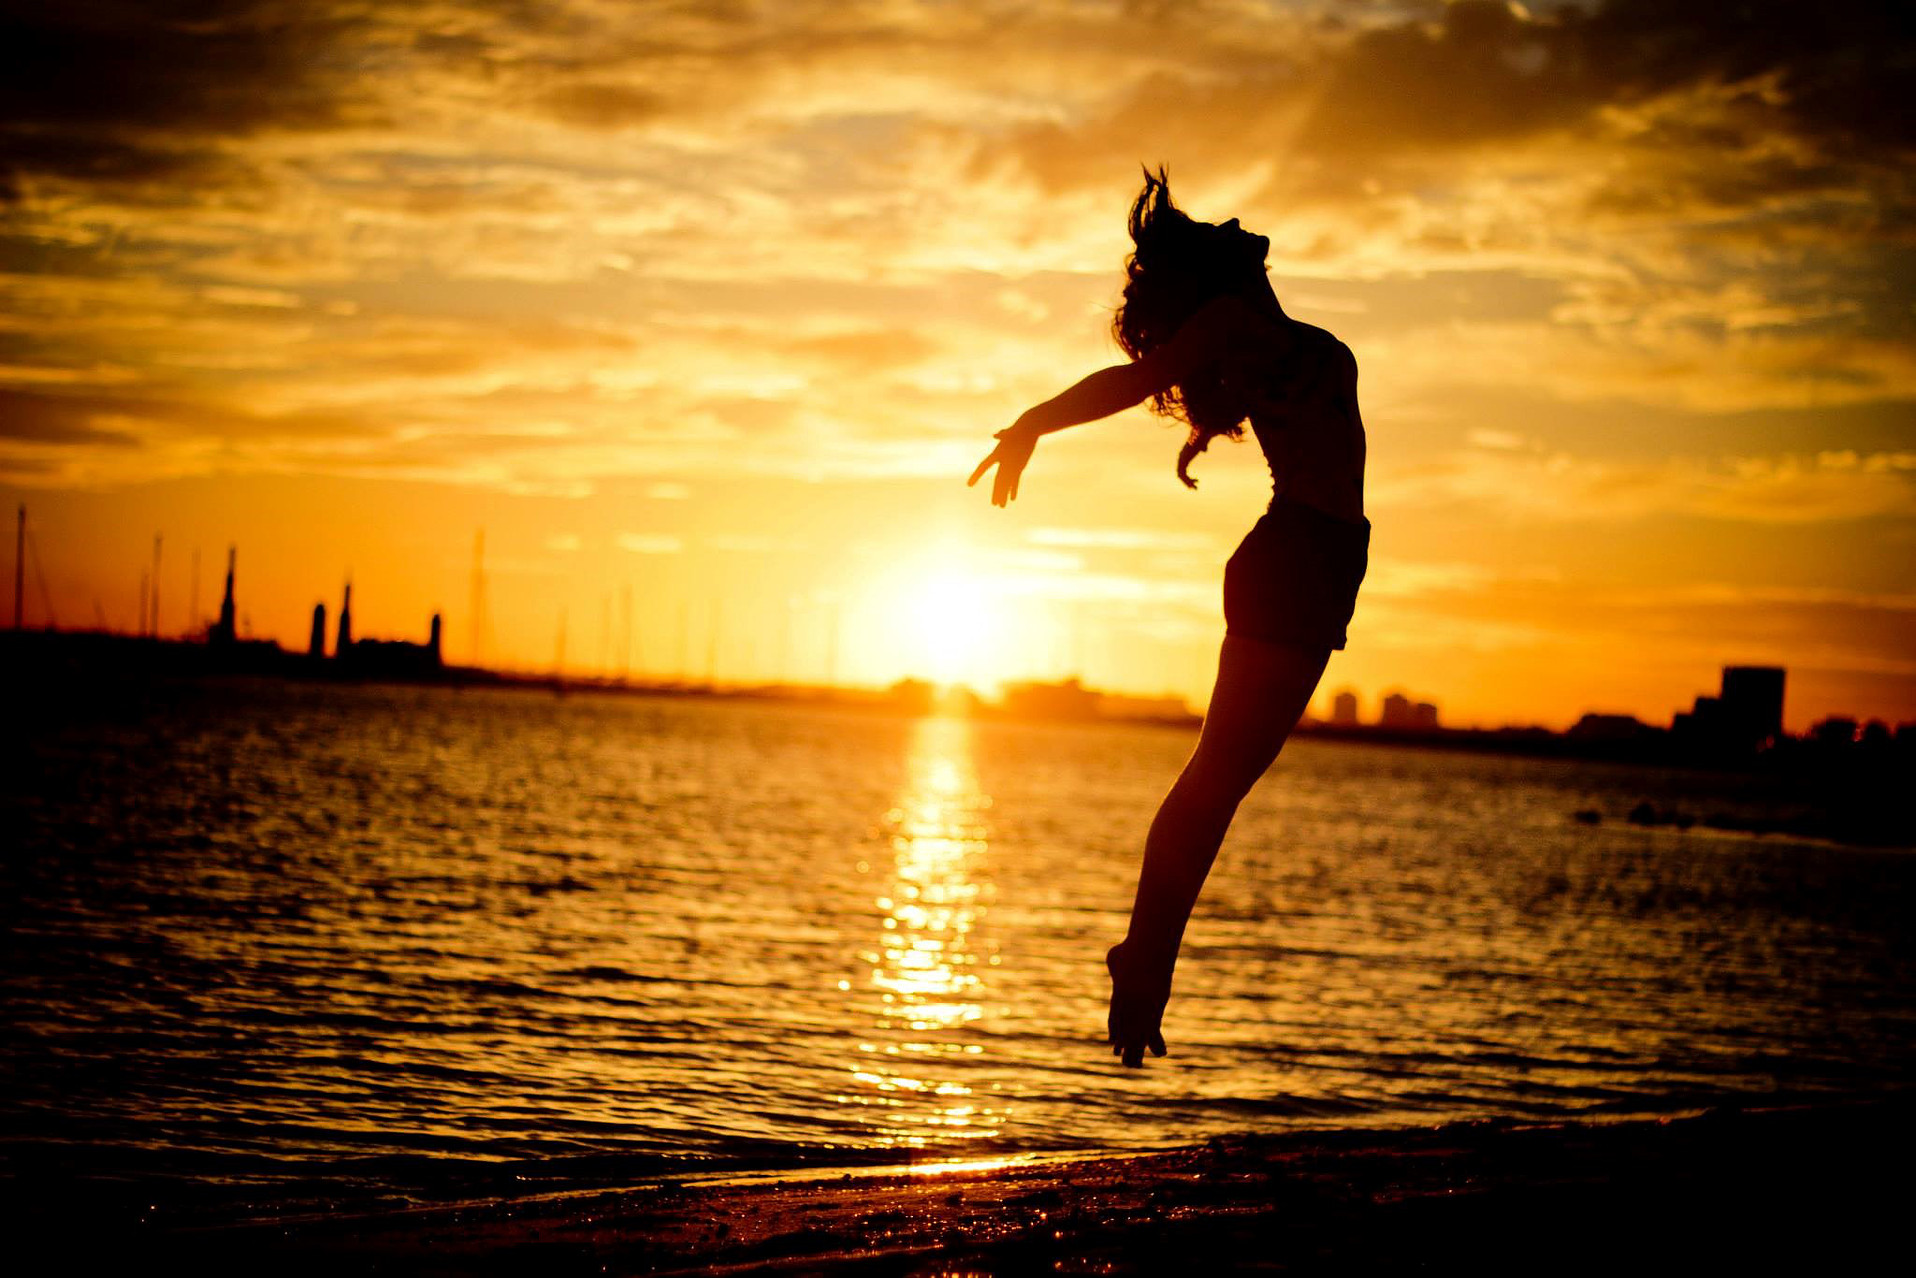 St Kilda Beach | Sunset Photography